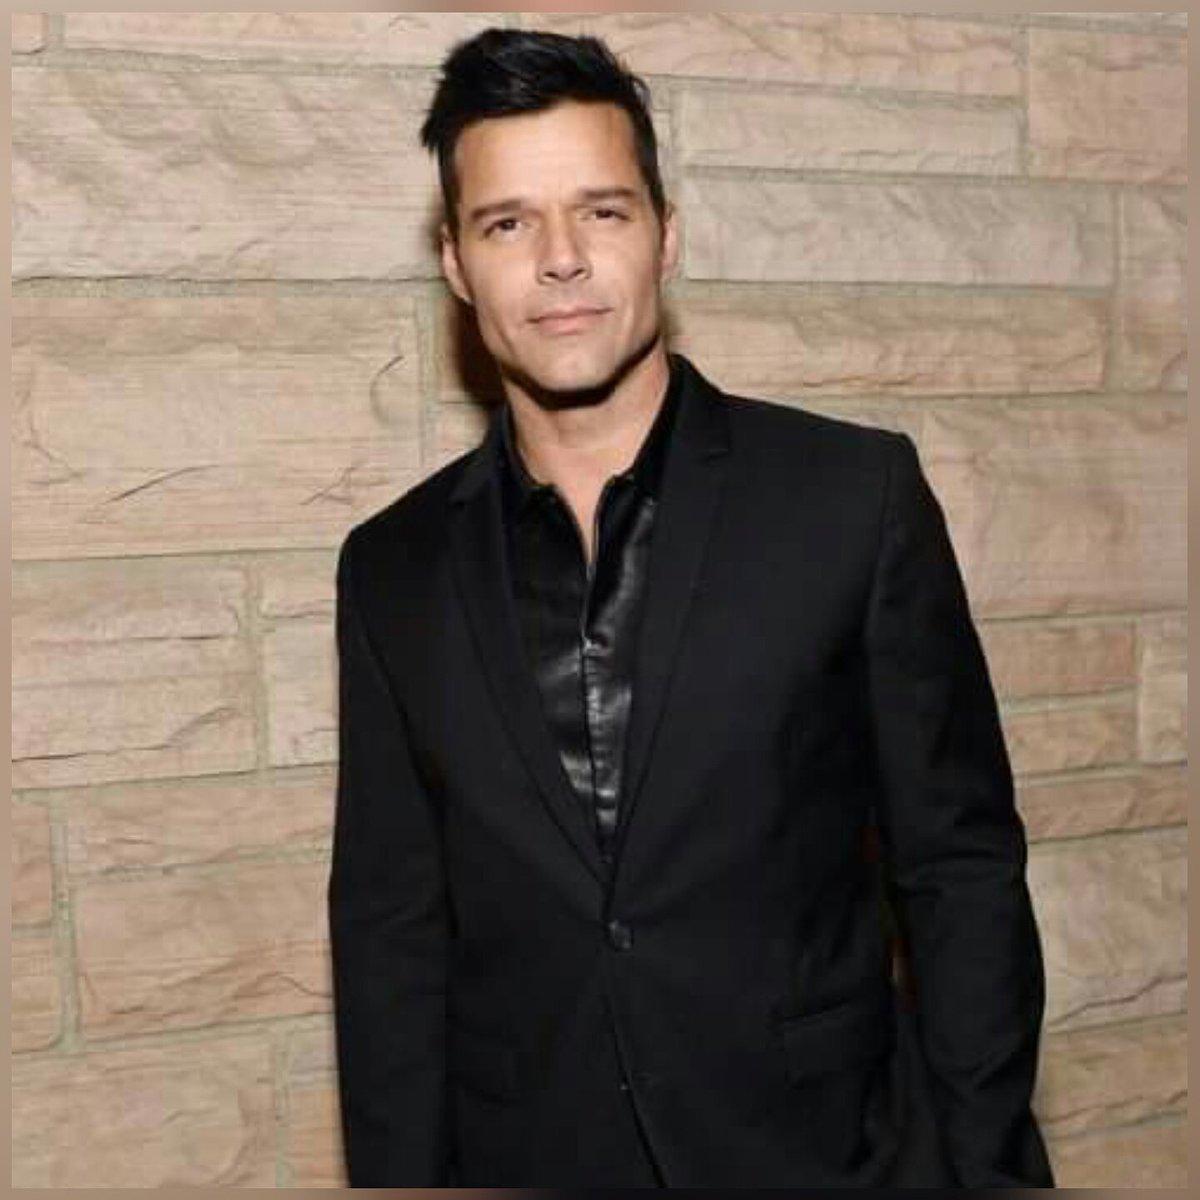 Cumpleanos Feliz Ricky Martin.Chris Martin On Twitter Feliz Cumpleanos Ricky Martin